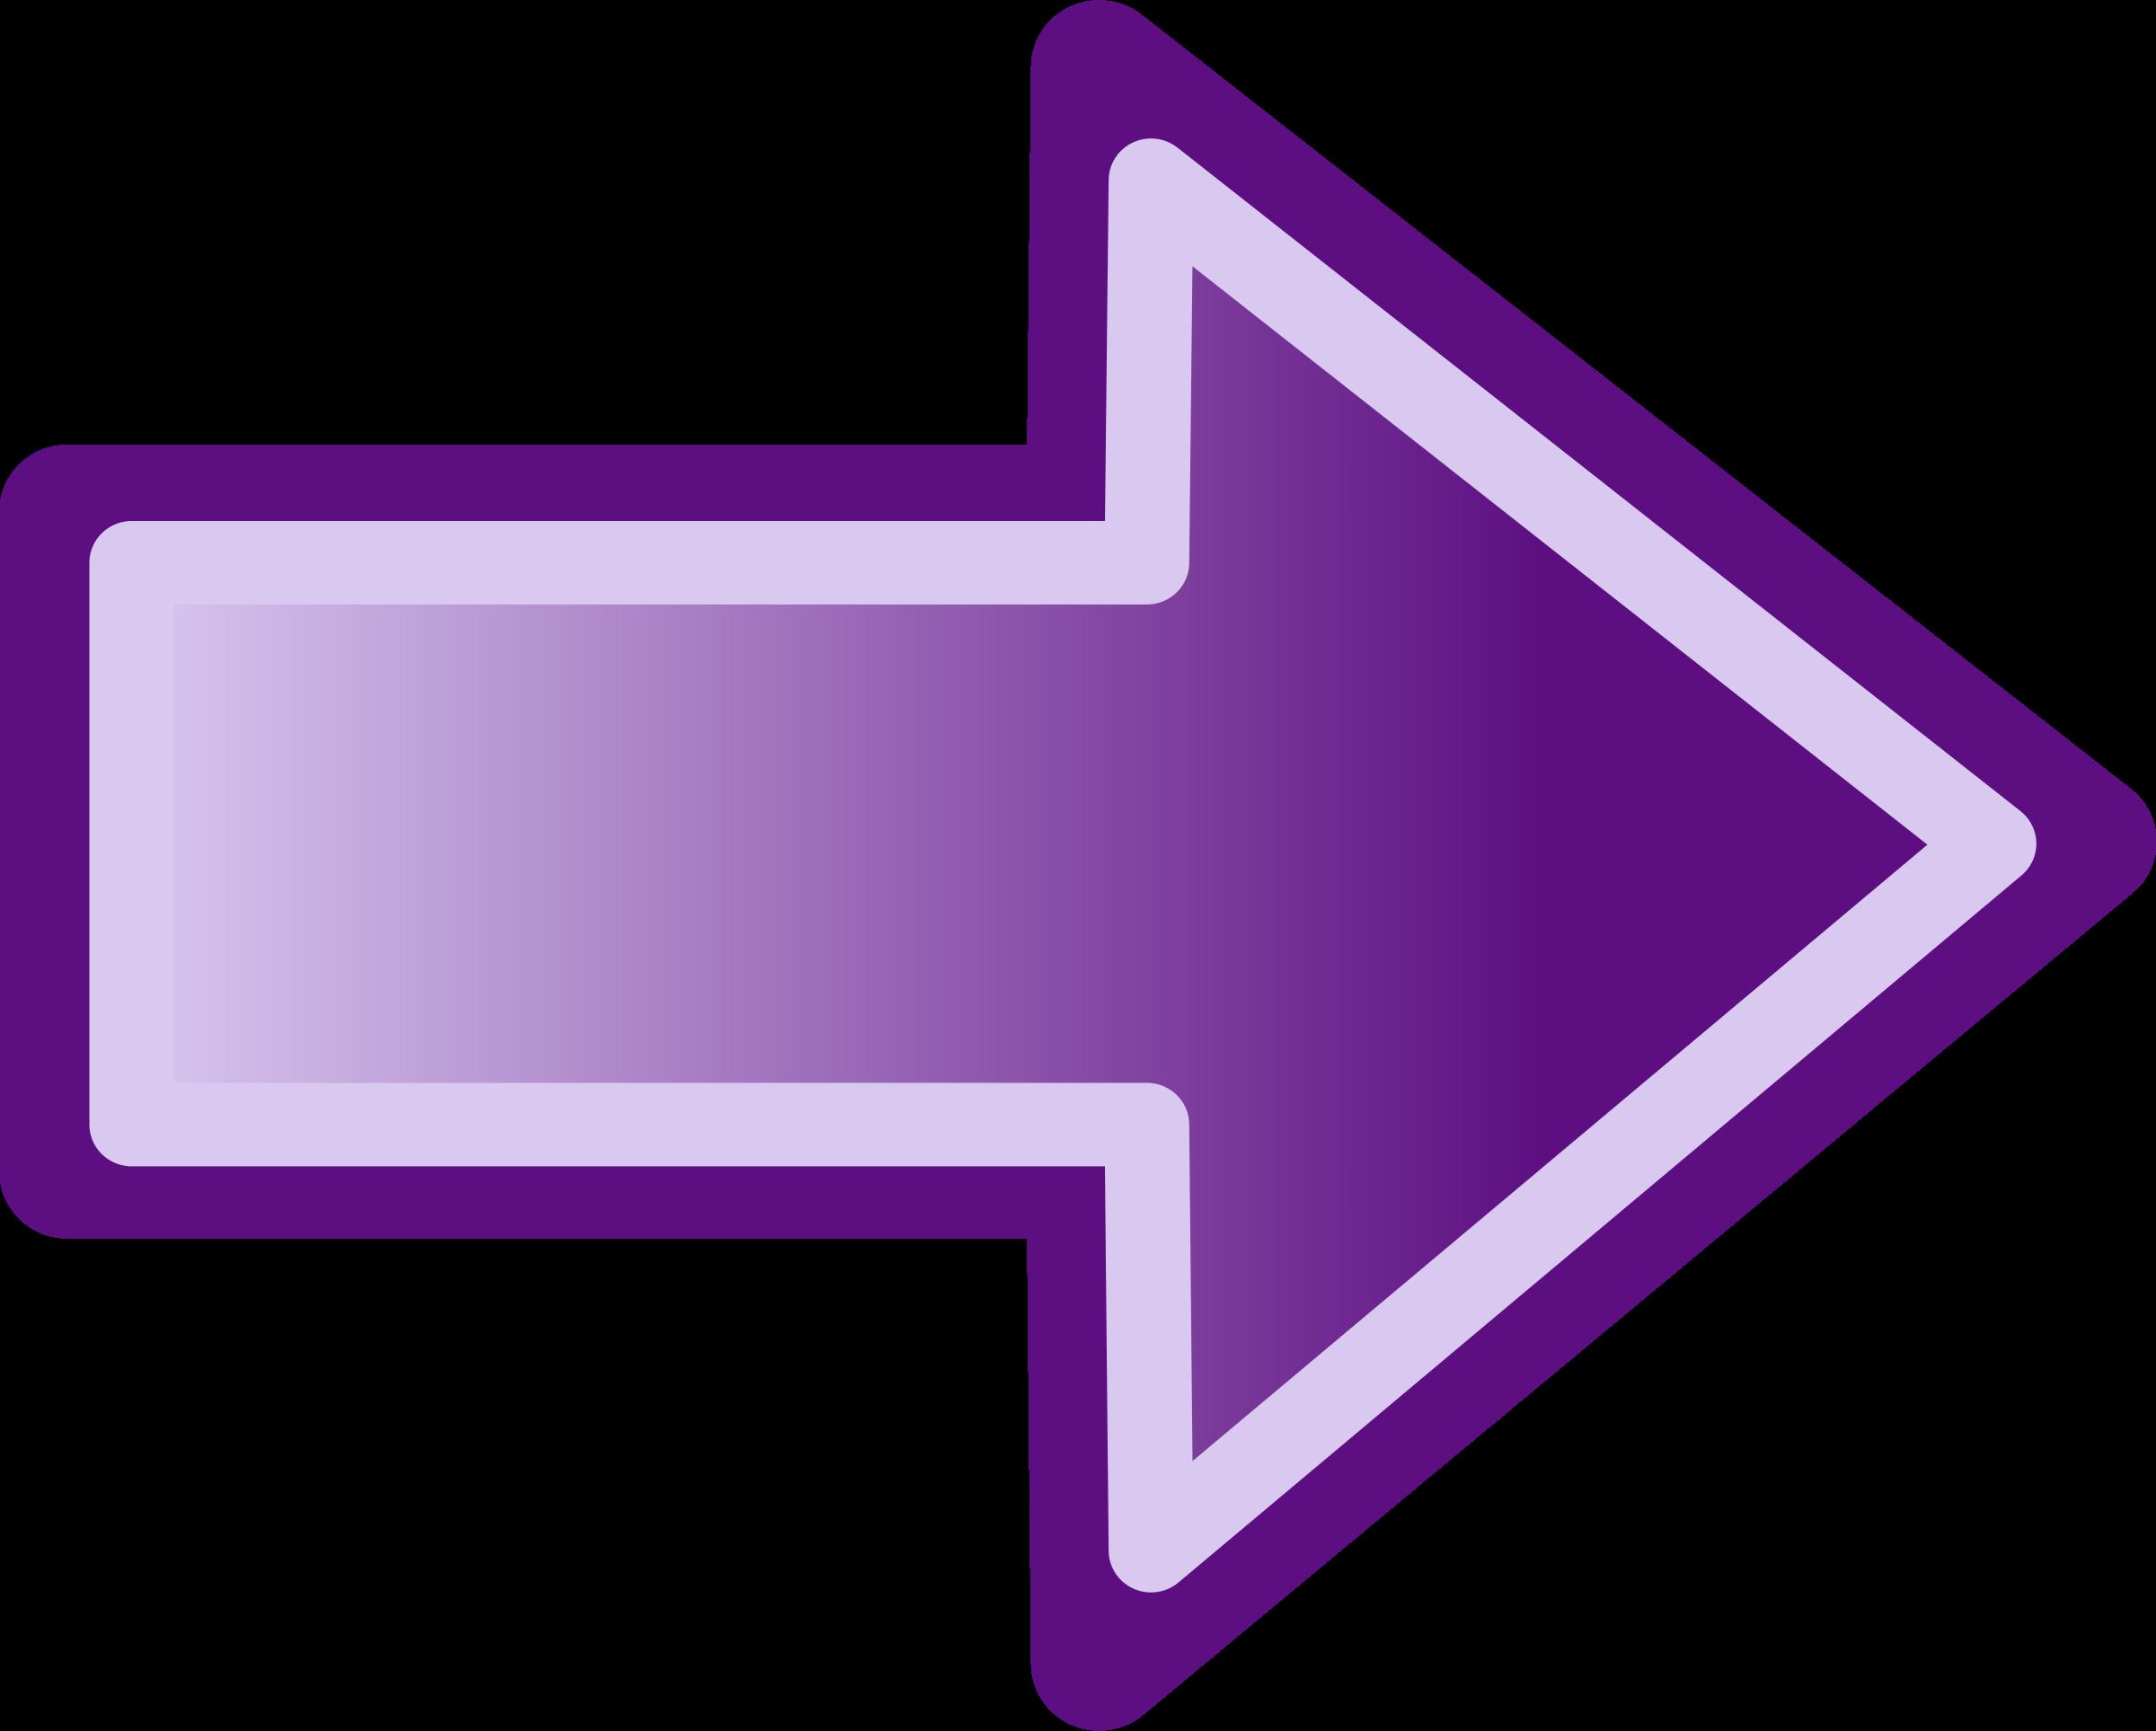 Purple shape big image. Location clipart arrow png